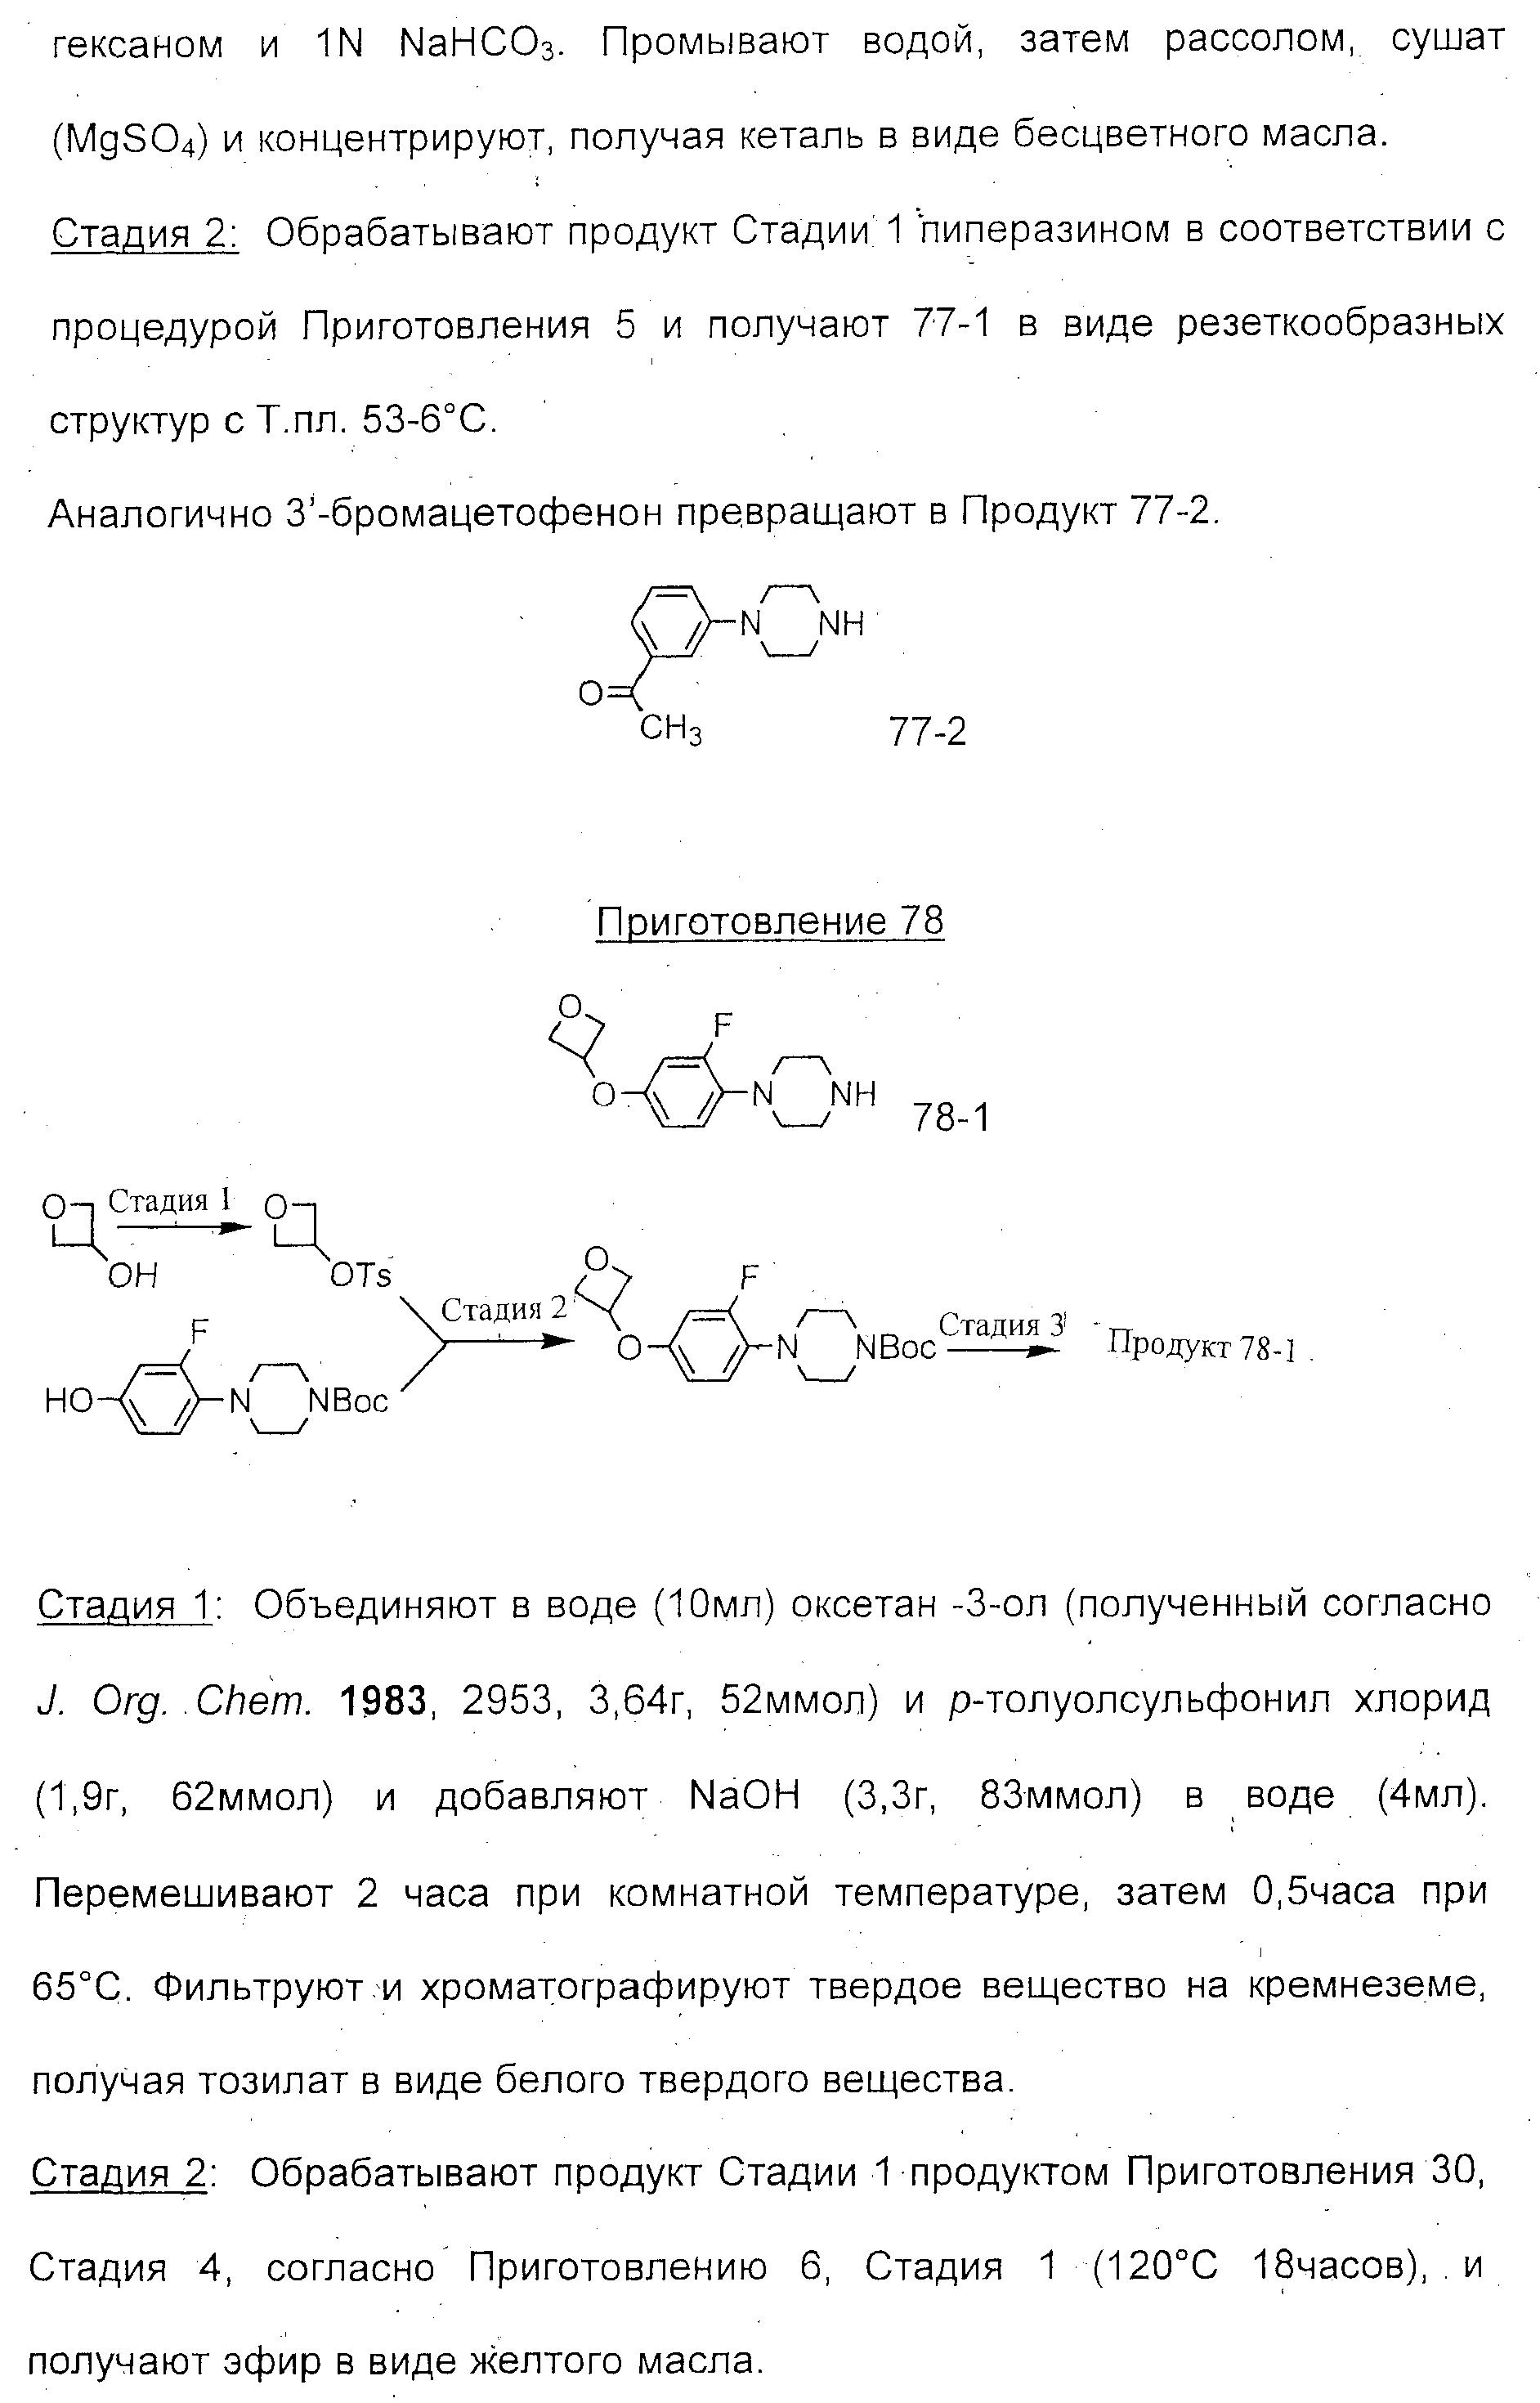 Figure 00000087